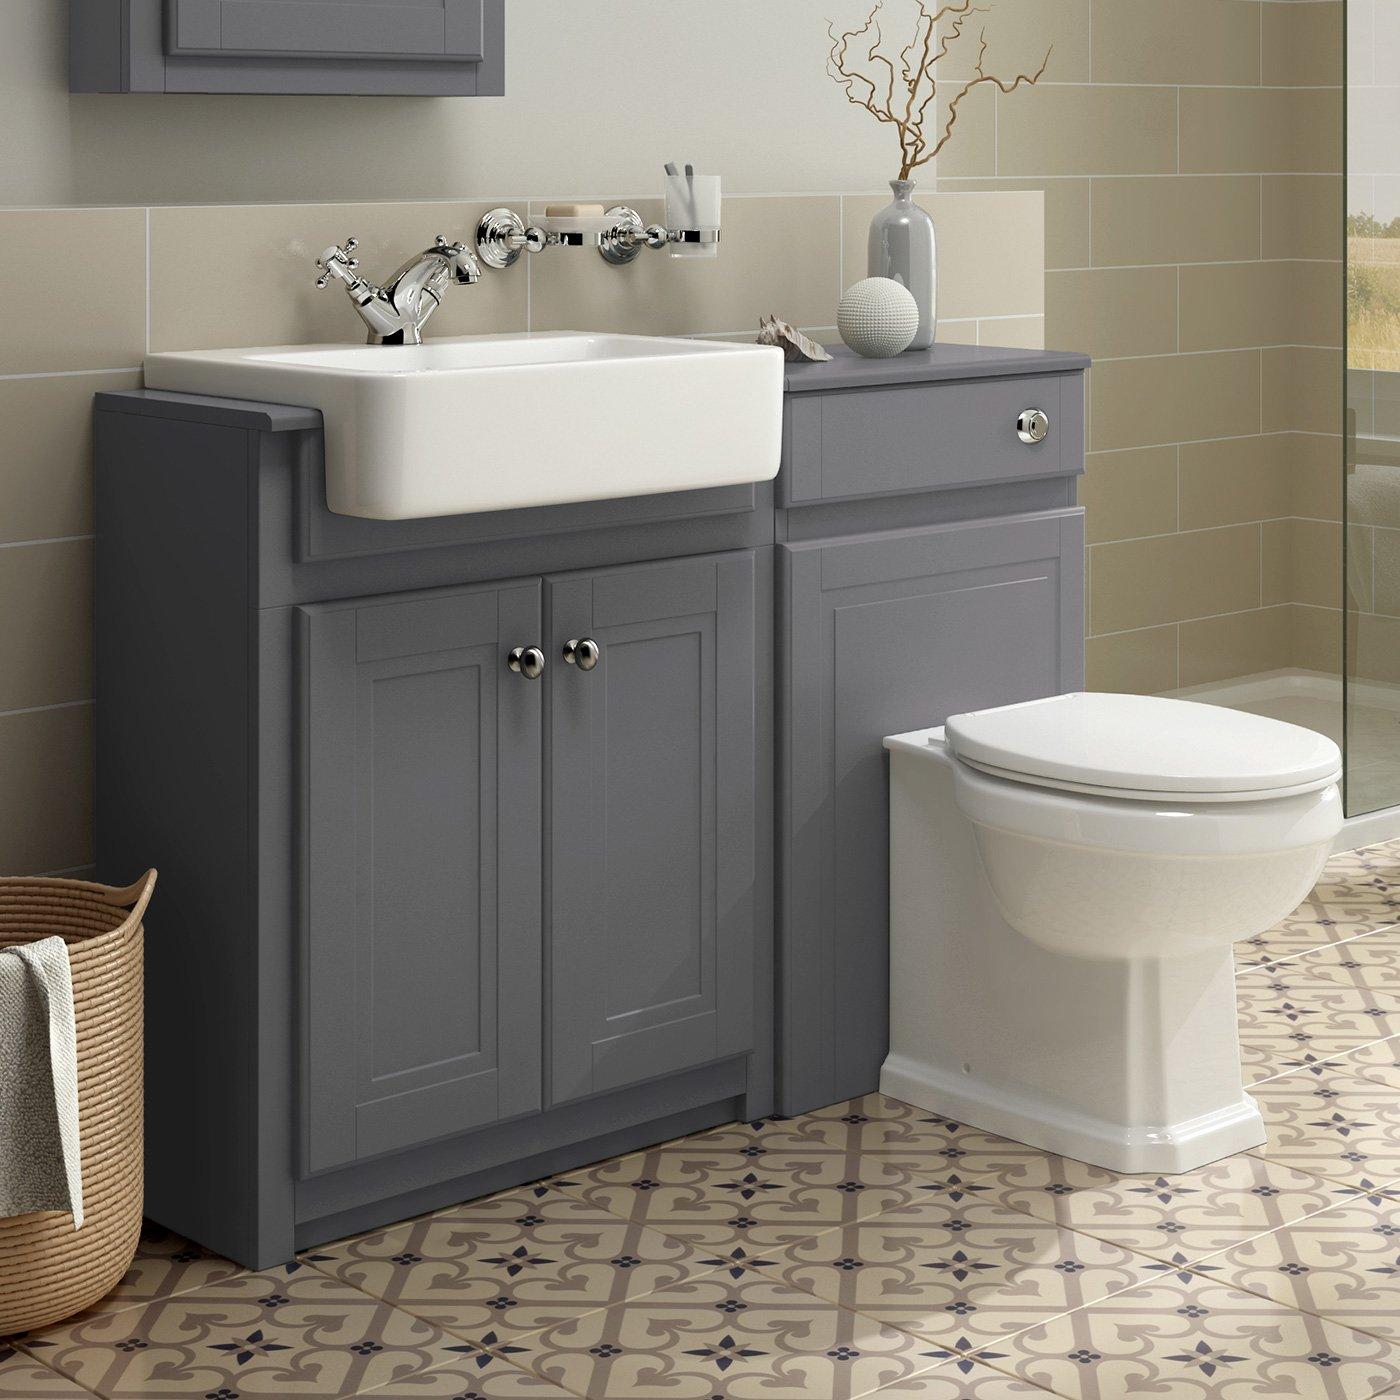 1100mm Combined Vanity Unit Toilet Basin Grey Bathroom Furniture ...